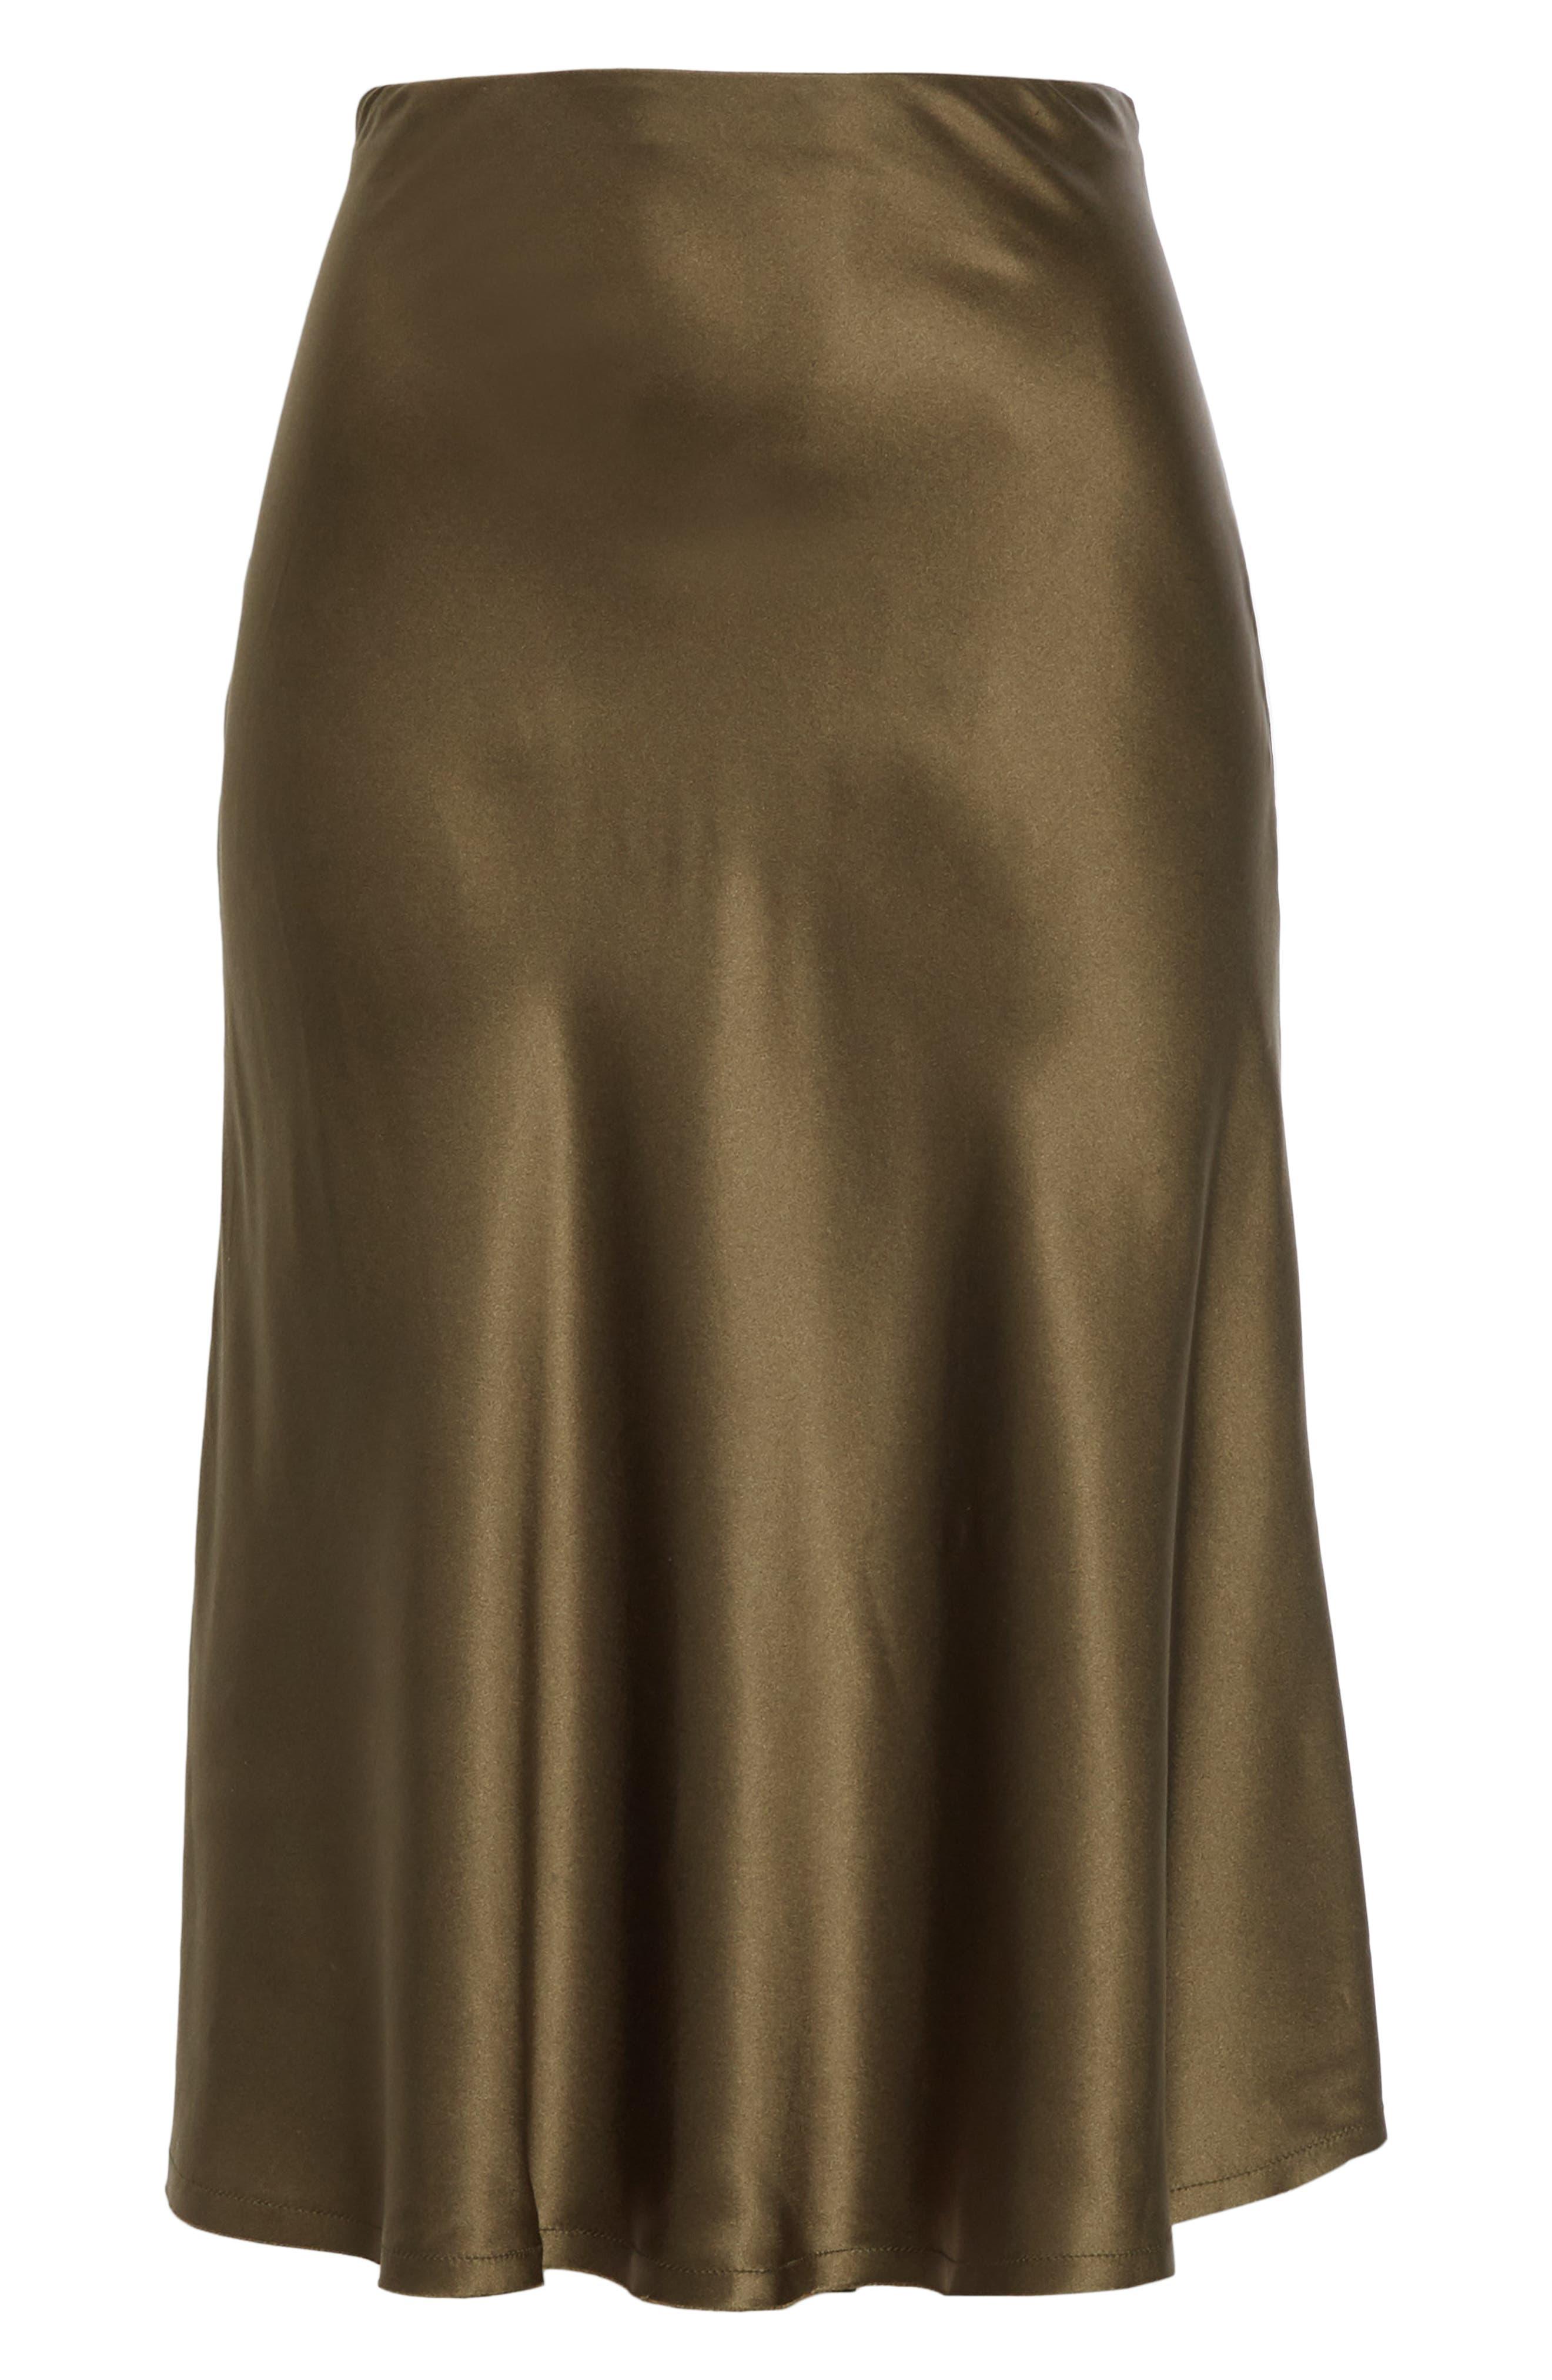 NILI LOTAN, Lane Silk Skirt, Alternate thumbnail 6, color, ARMY GREEN